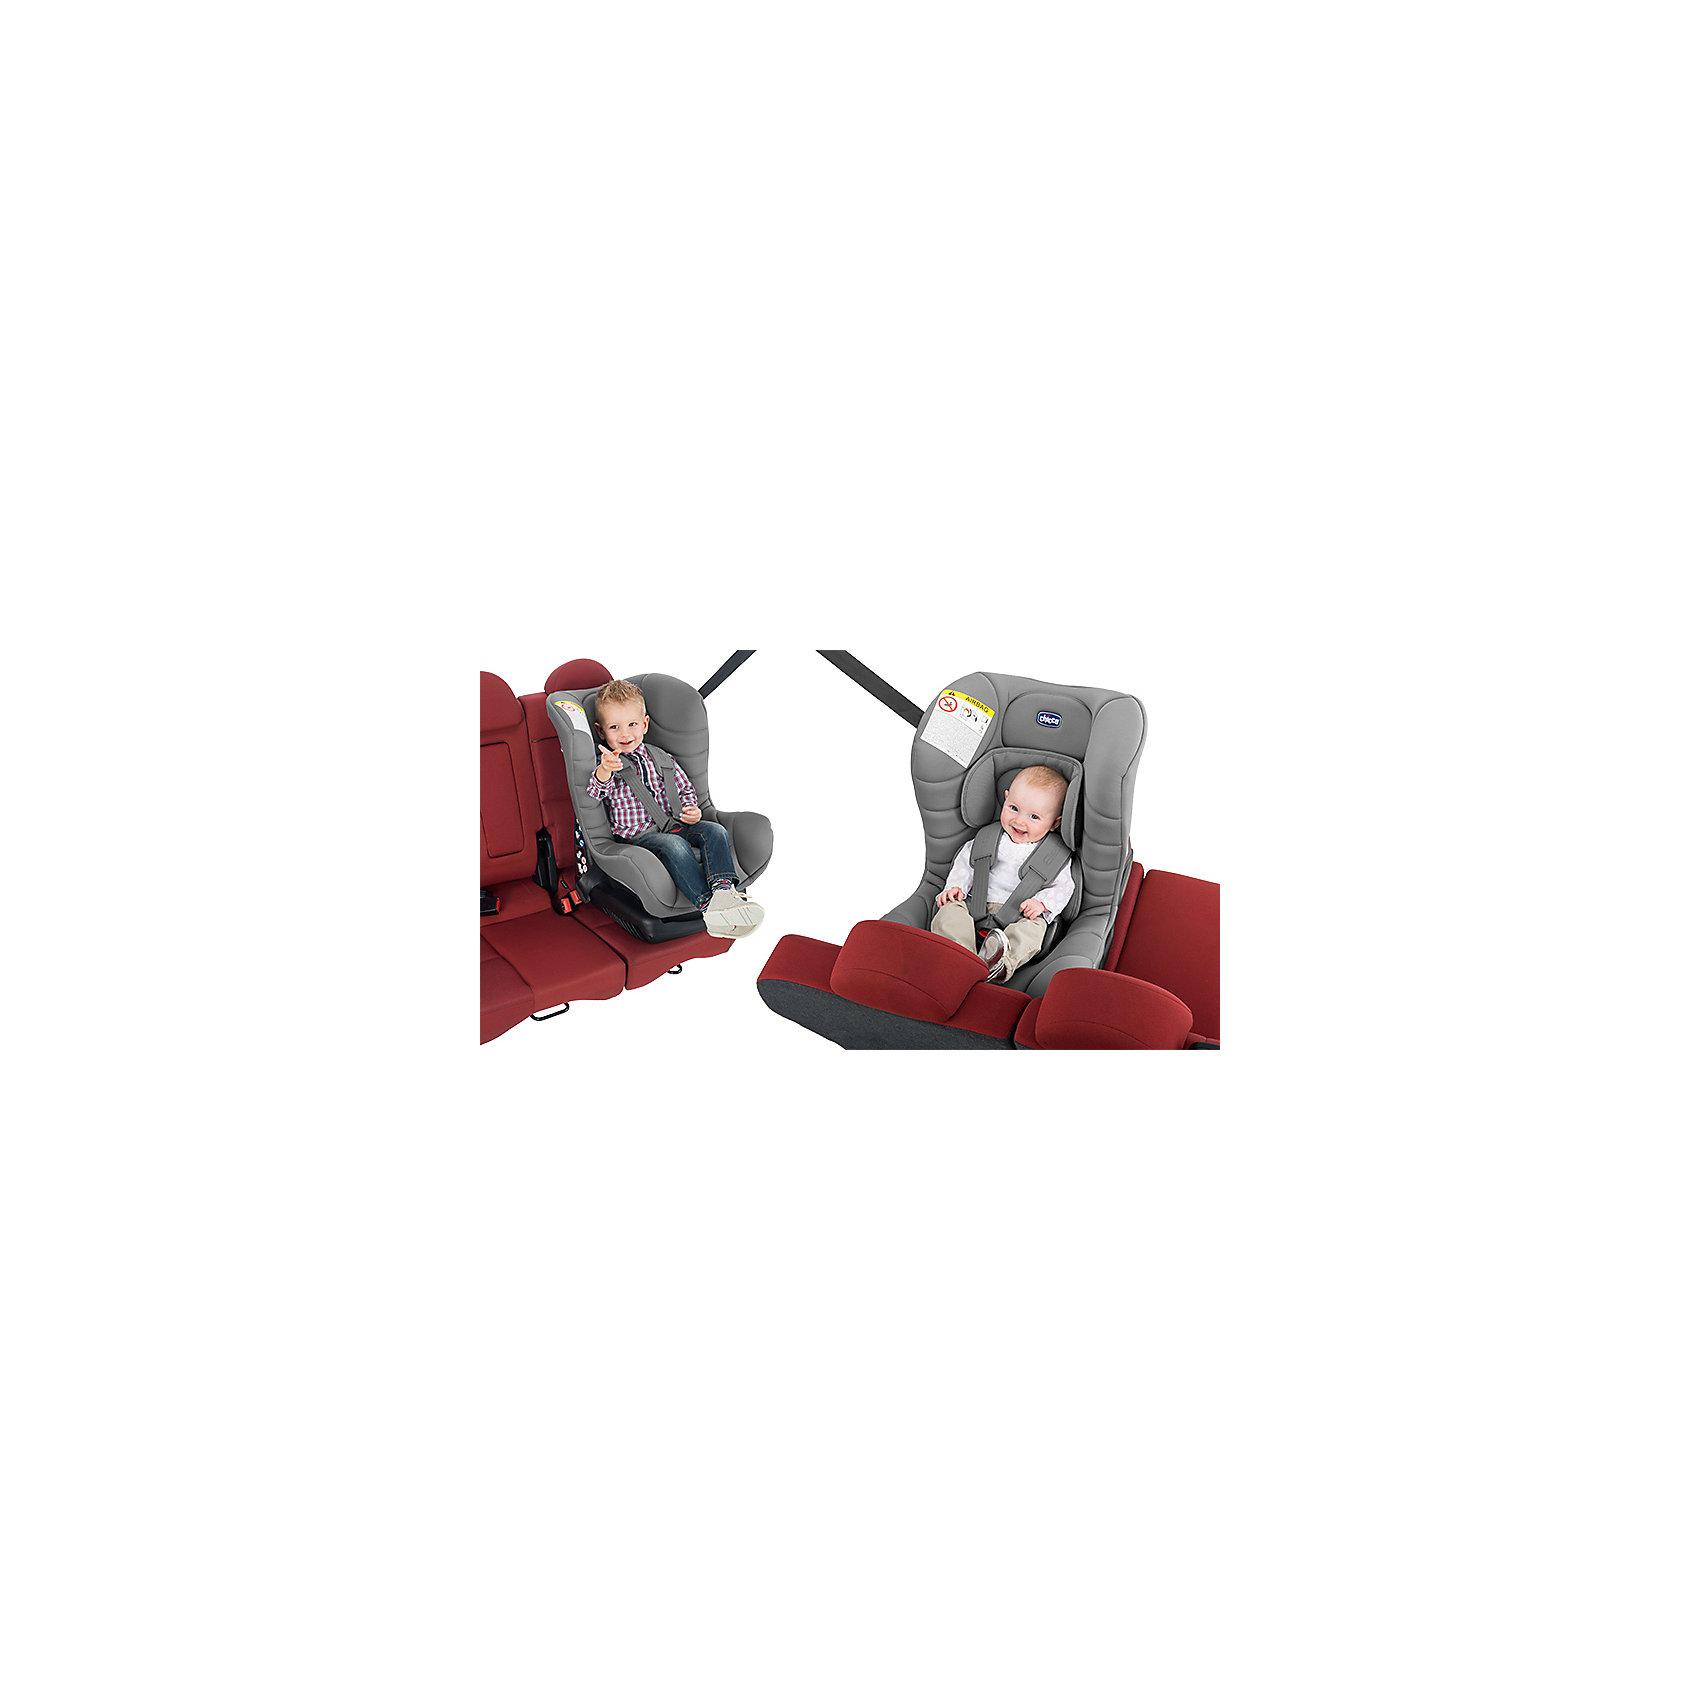 Автокресло Eletta Comfort, 0-18 кг., CHICCO, silver